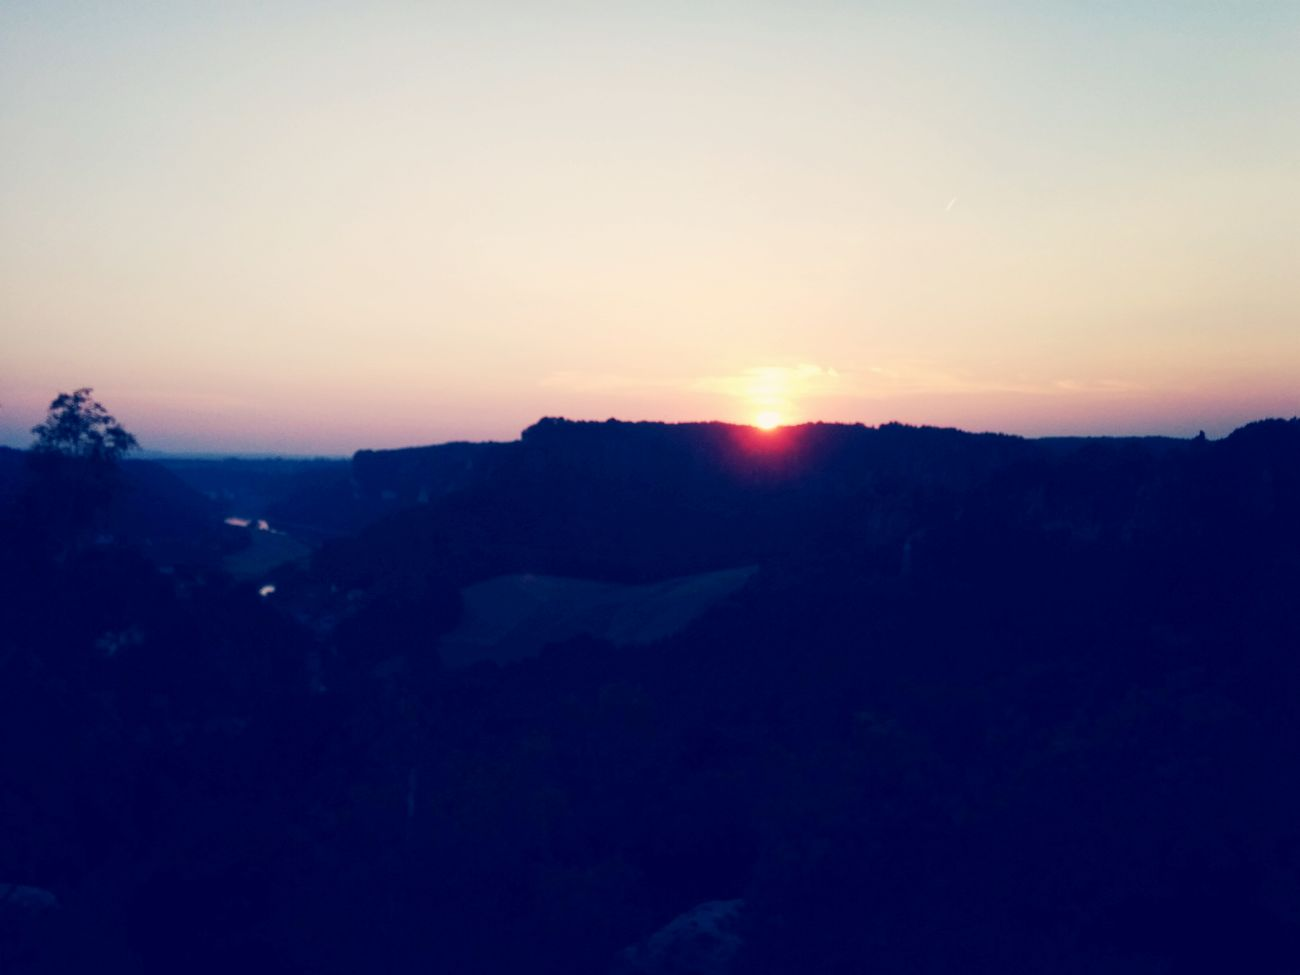 Taking Photos Sunrise Beautiful Nature Dreaming